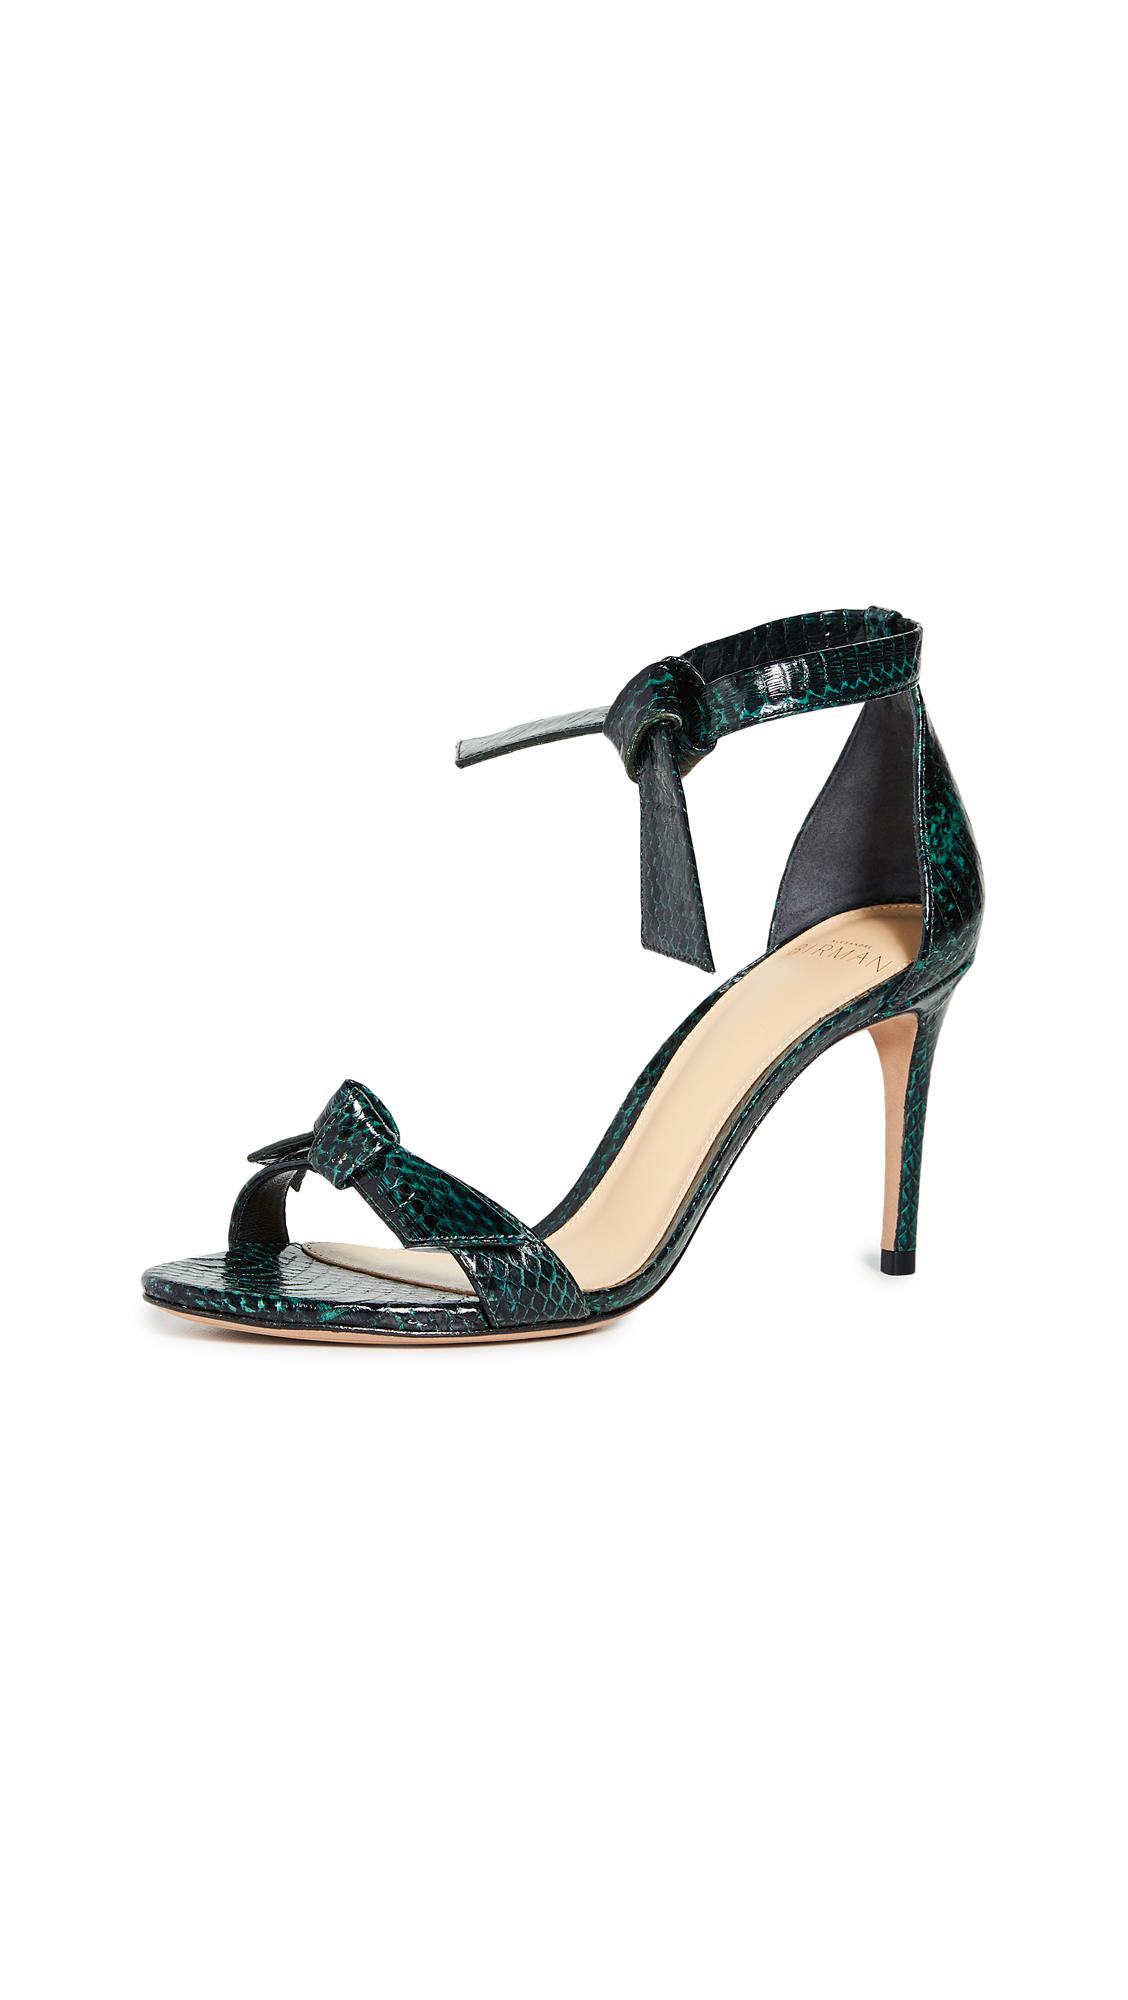 Alexandre Birman Clarita 85mm Exotic Sandals - 50% Off Sale